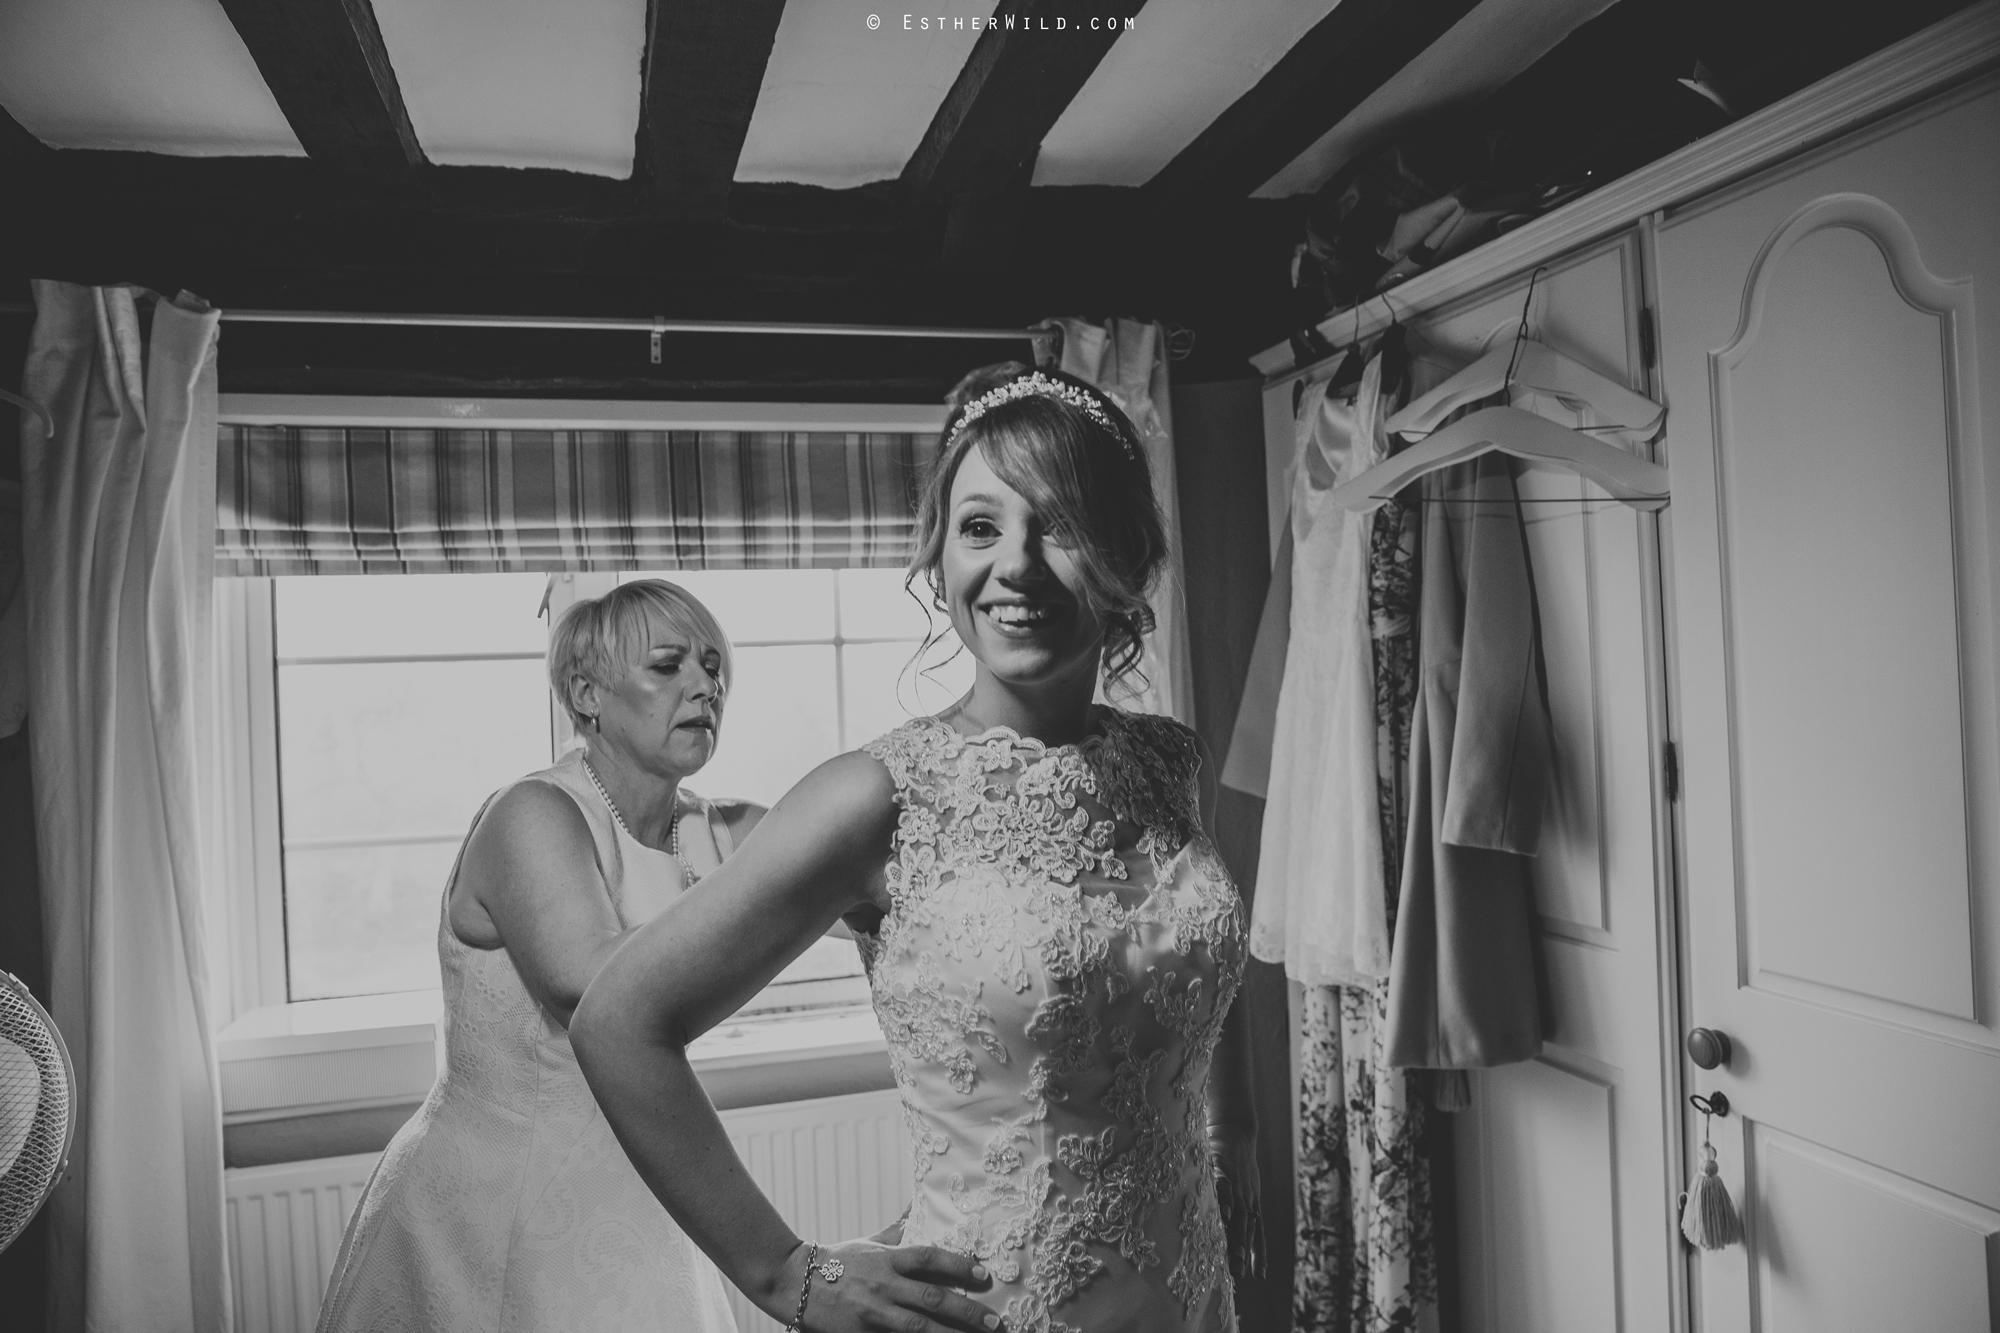 Wedding_Photography_Diss_Gawdy_Hall_Redenhall_Church_Norfolk_Winter_Esther_Wild_Copyright_IMG_0883-2.jpg